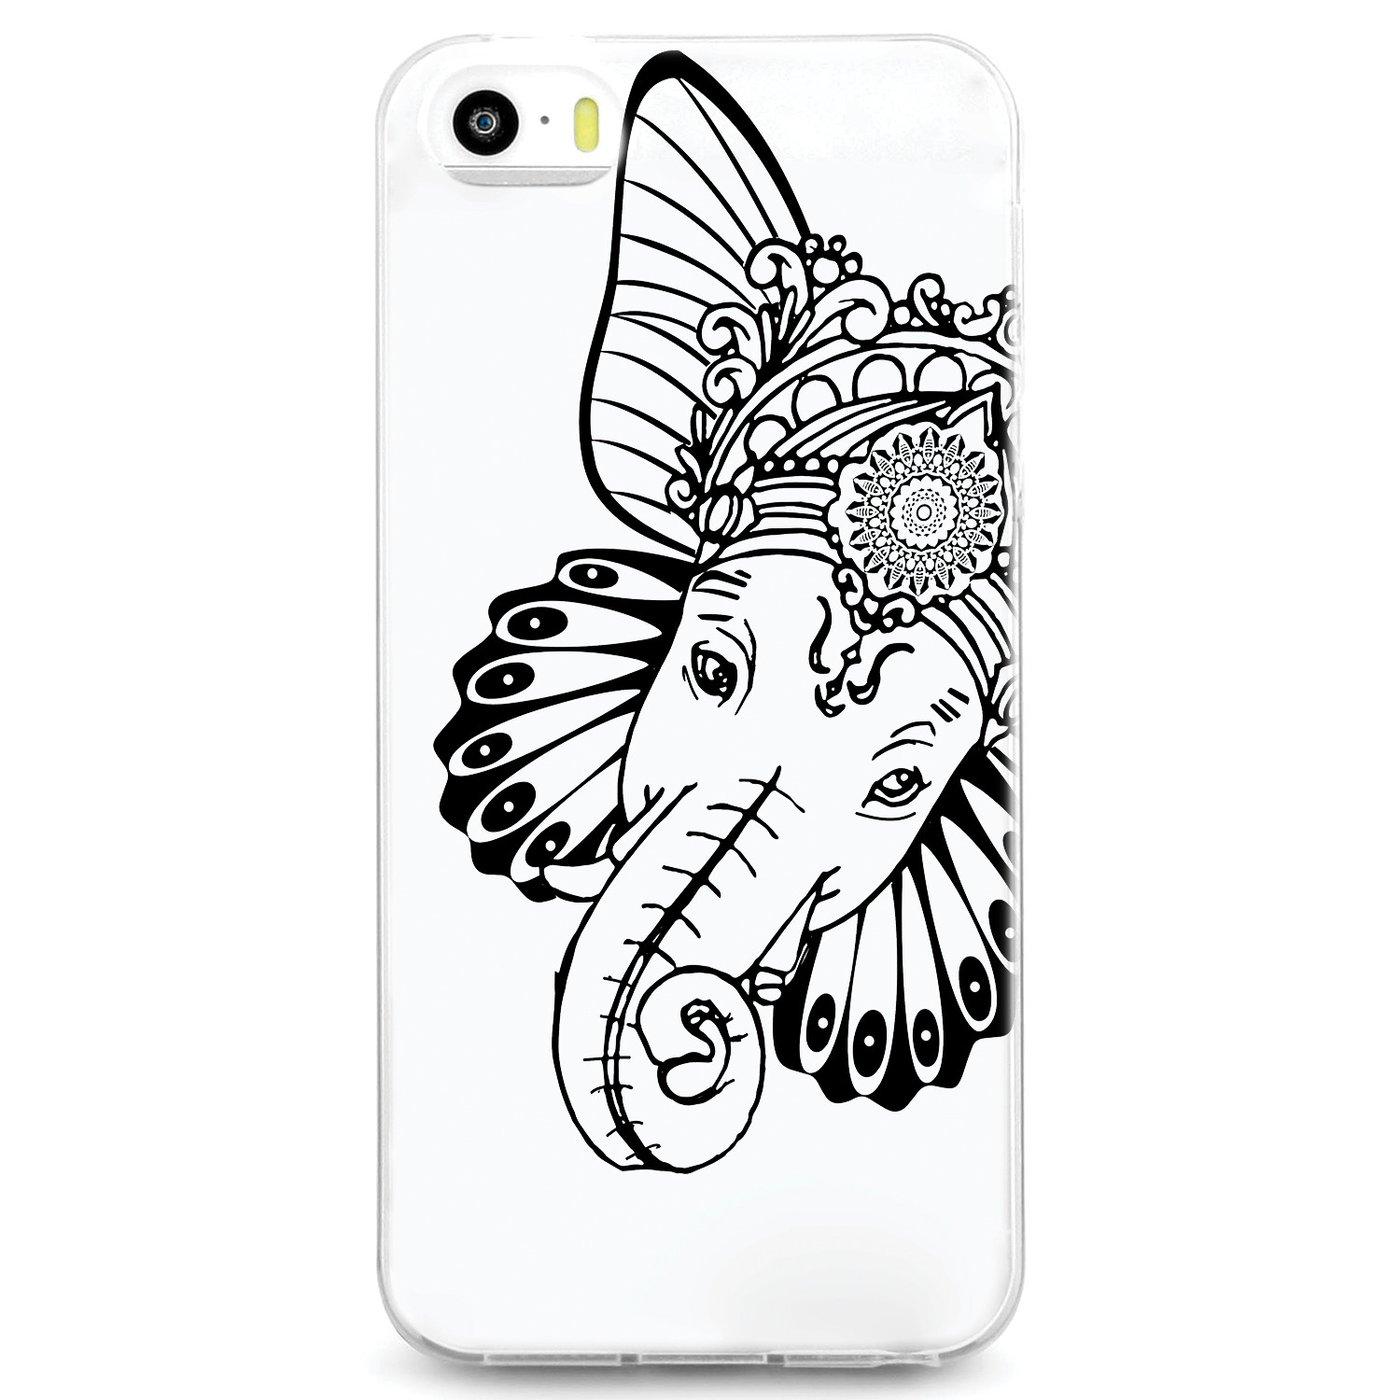 1400x1400 Uv Printed Tpu Case Spiritual Animal Hindu Elephant God Ganesha